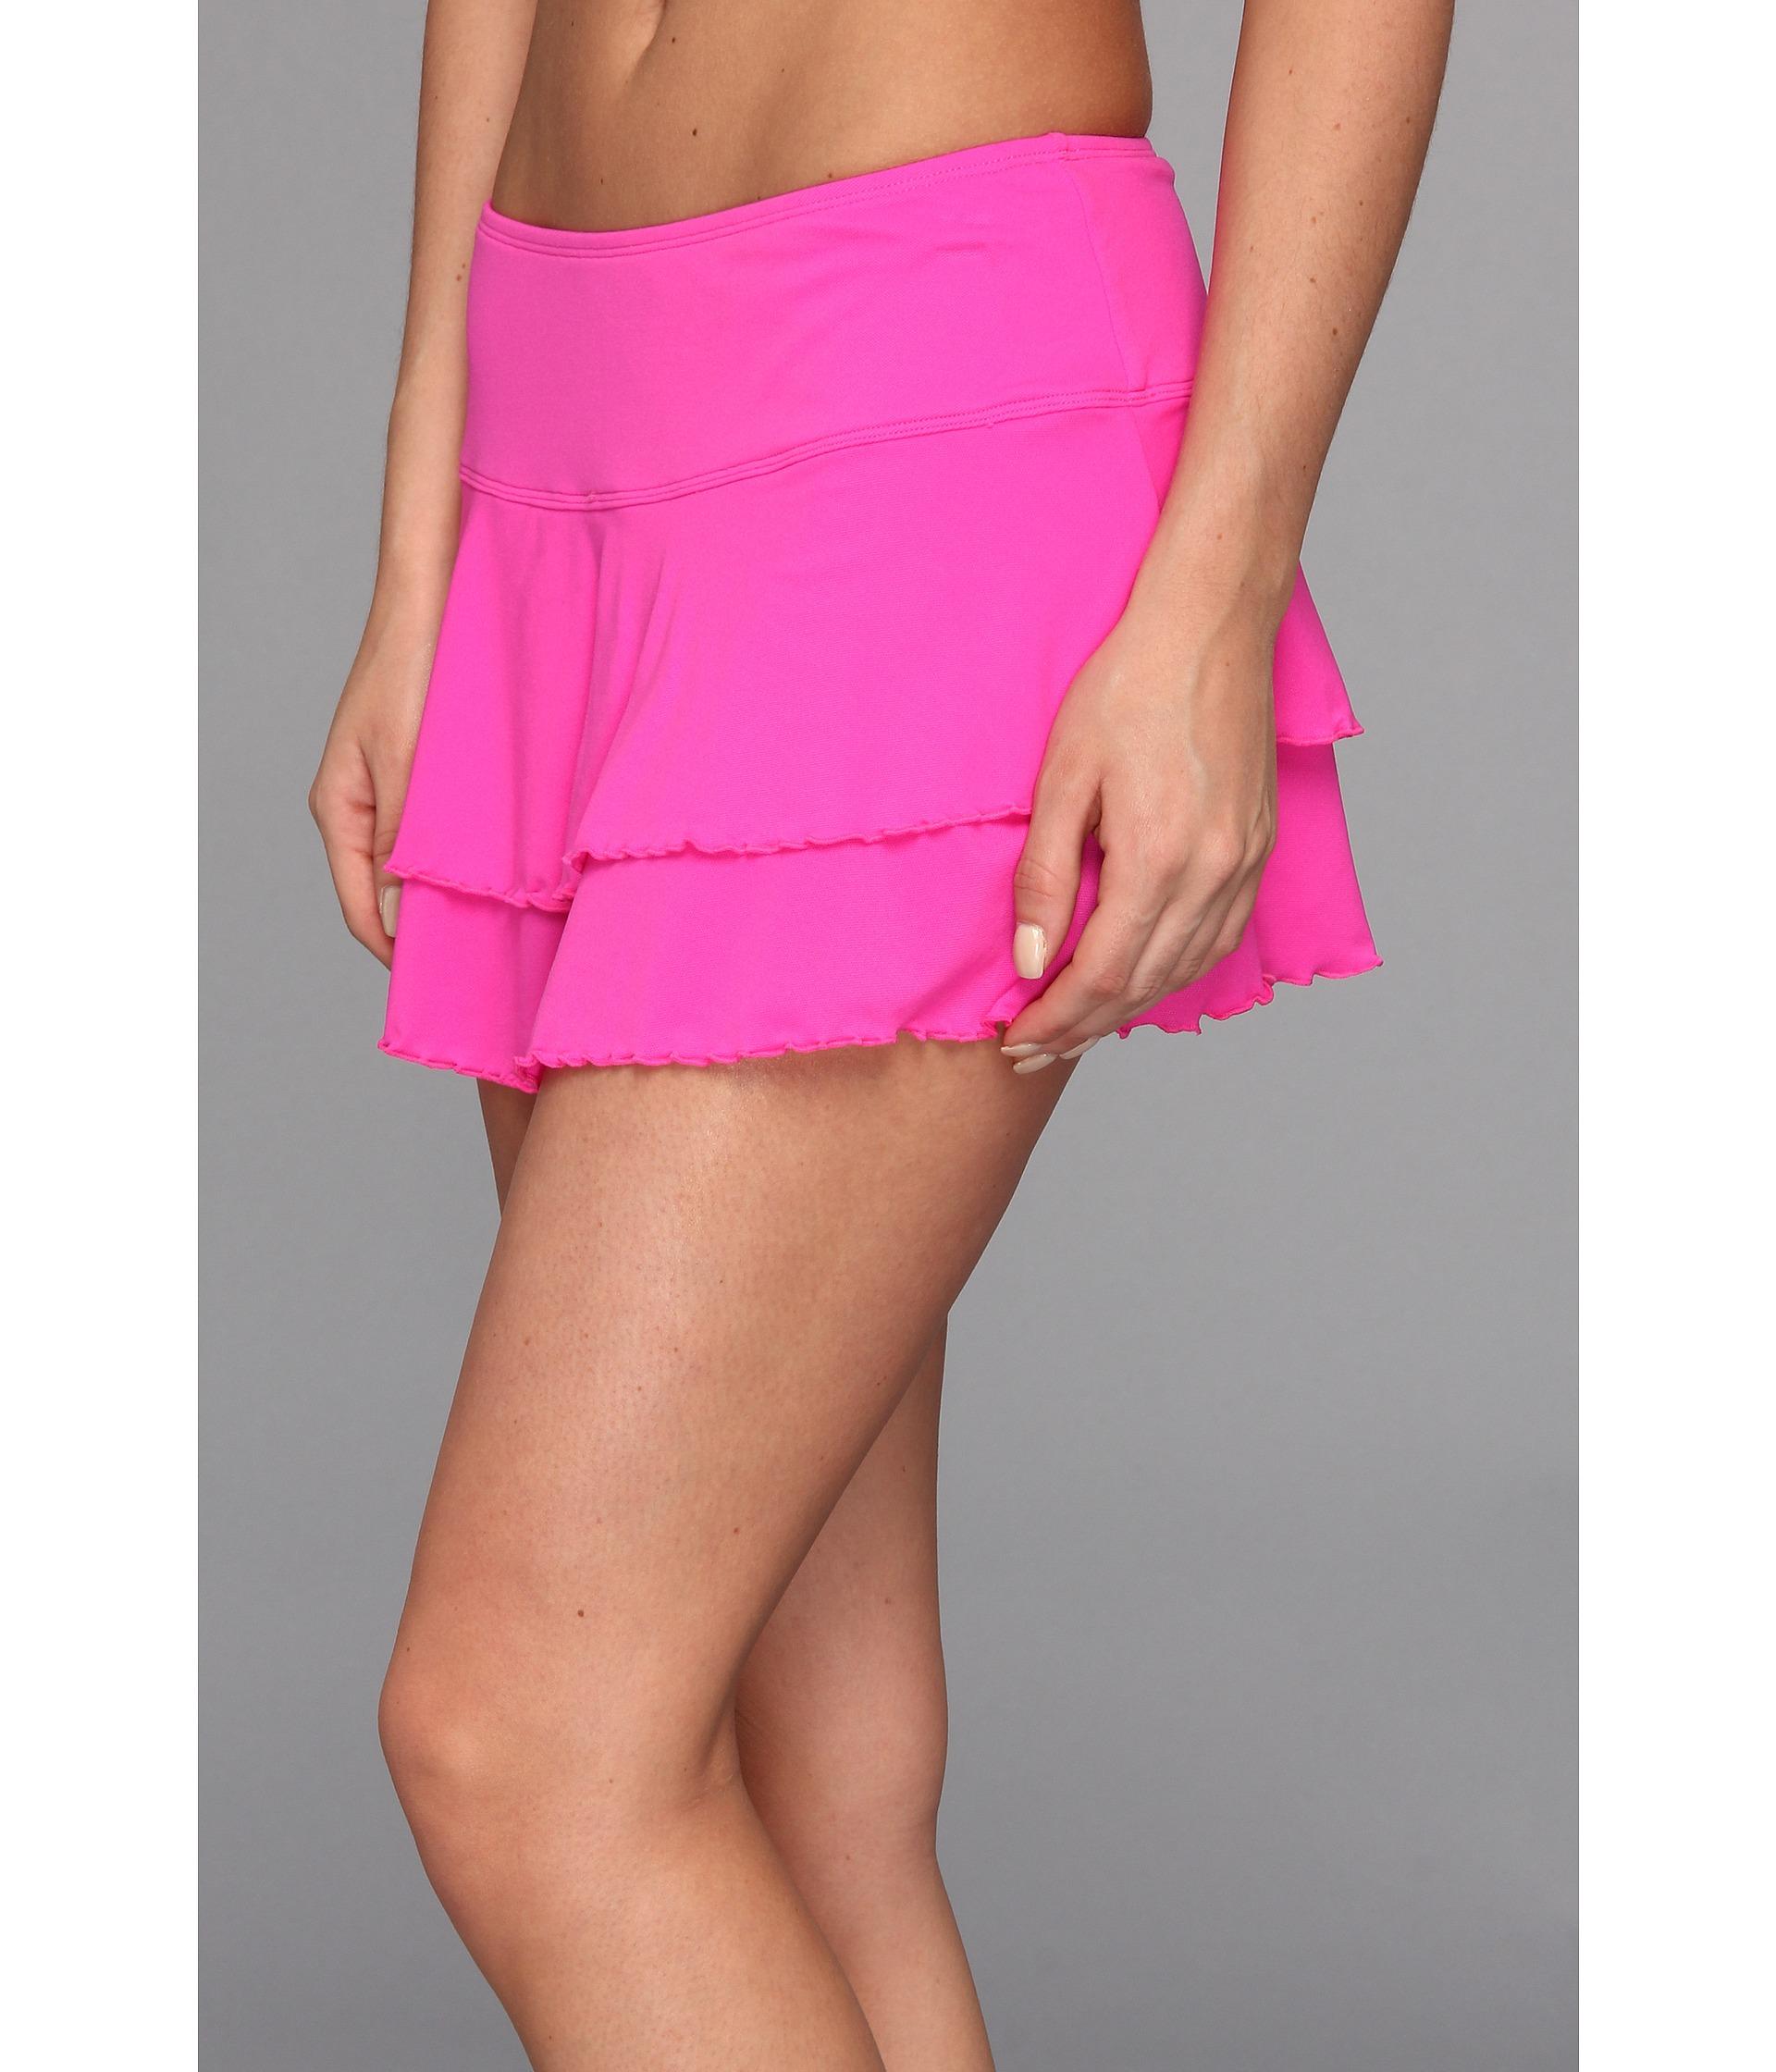 Body Glove Skirt 77